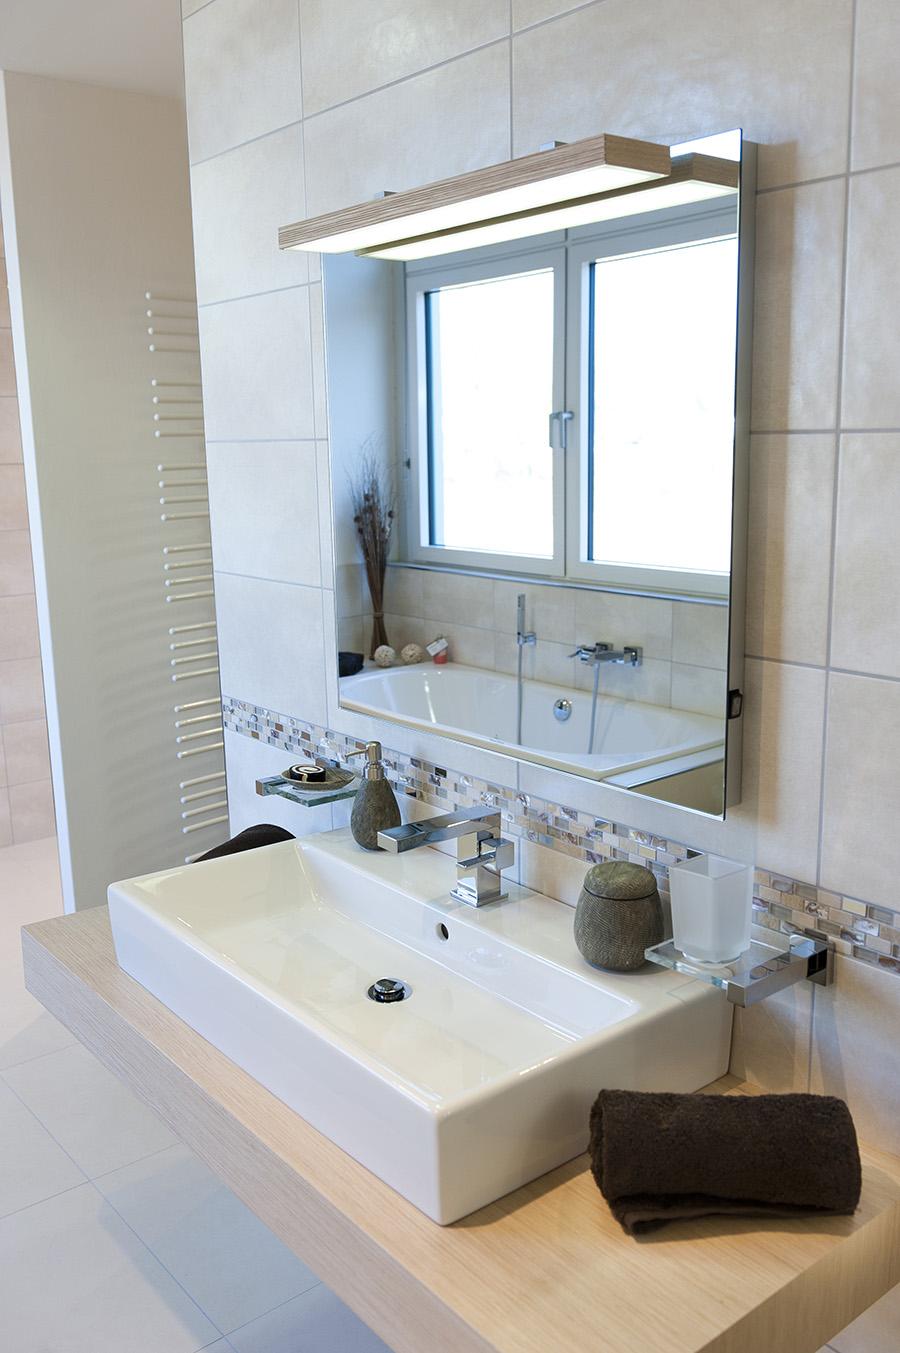 Badausstellung Ulm badausstellung karlsruhe stadt design badausstellung badstudio